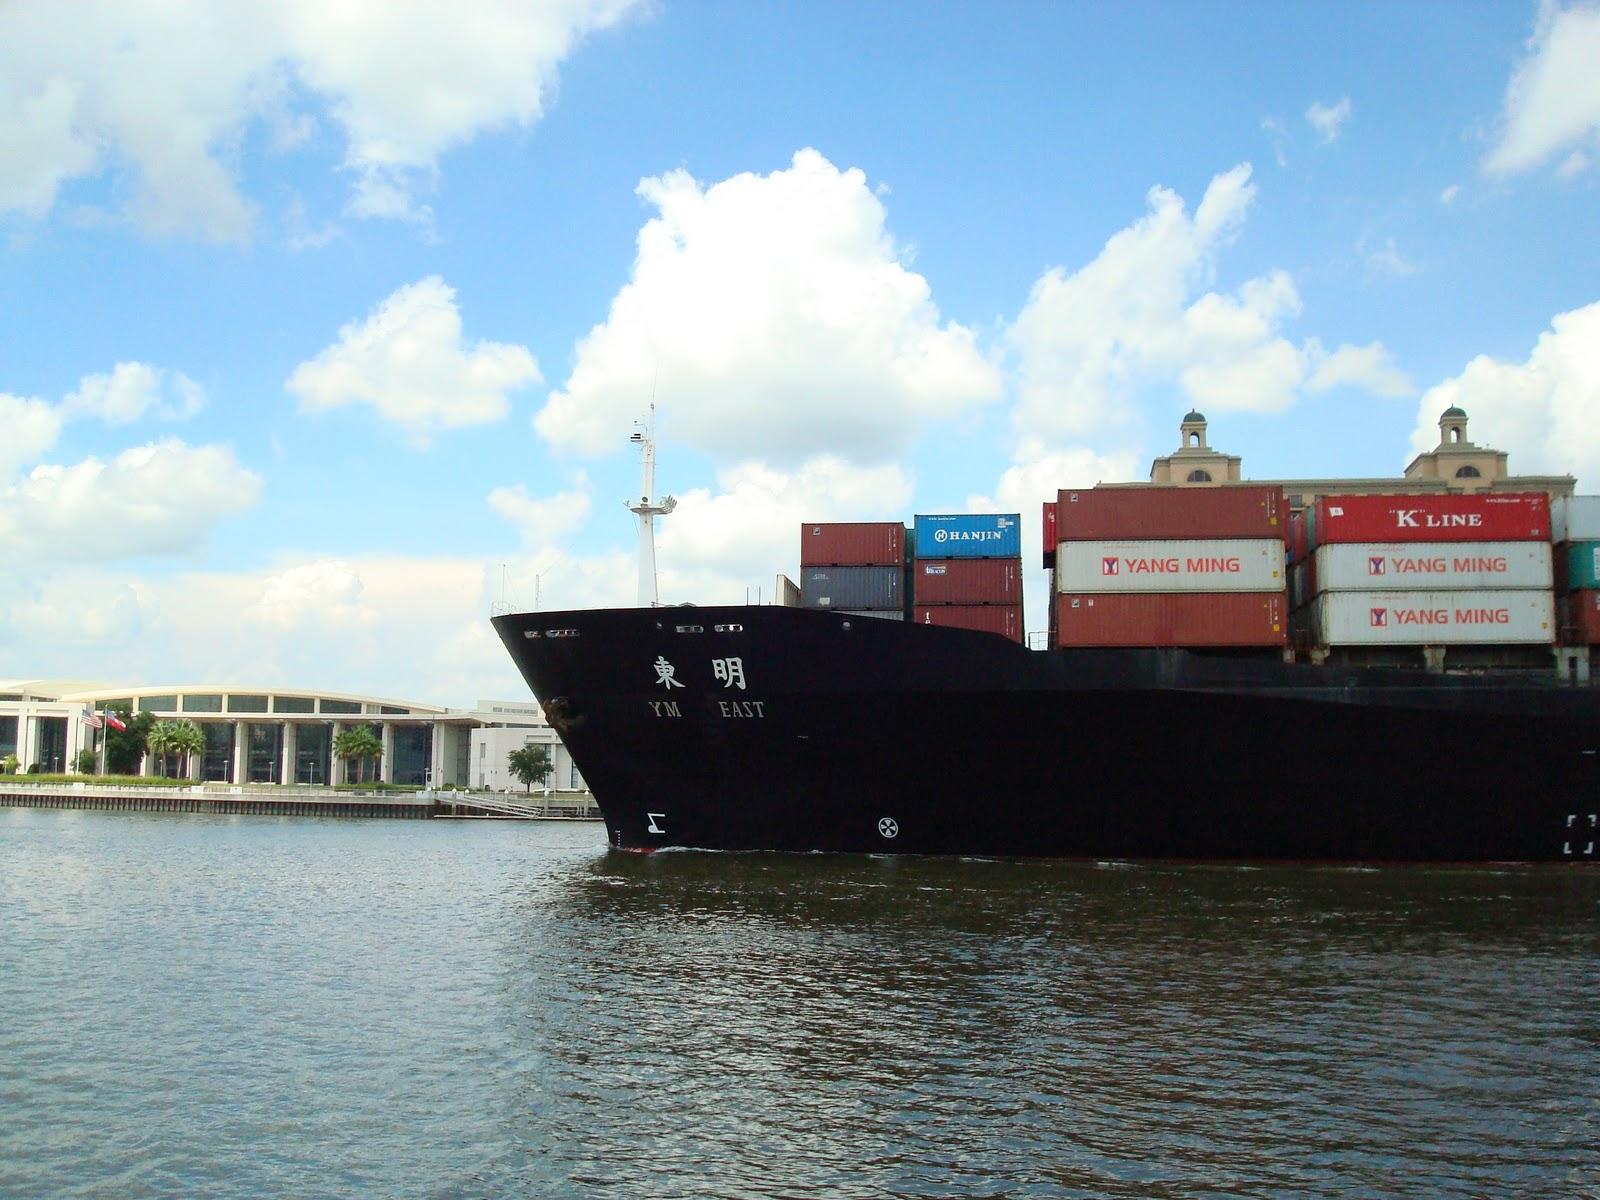 Island Passage: Savannah, GA